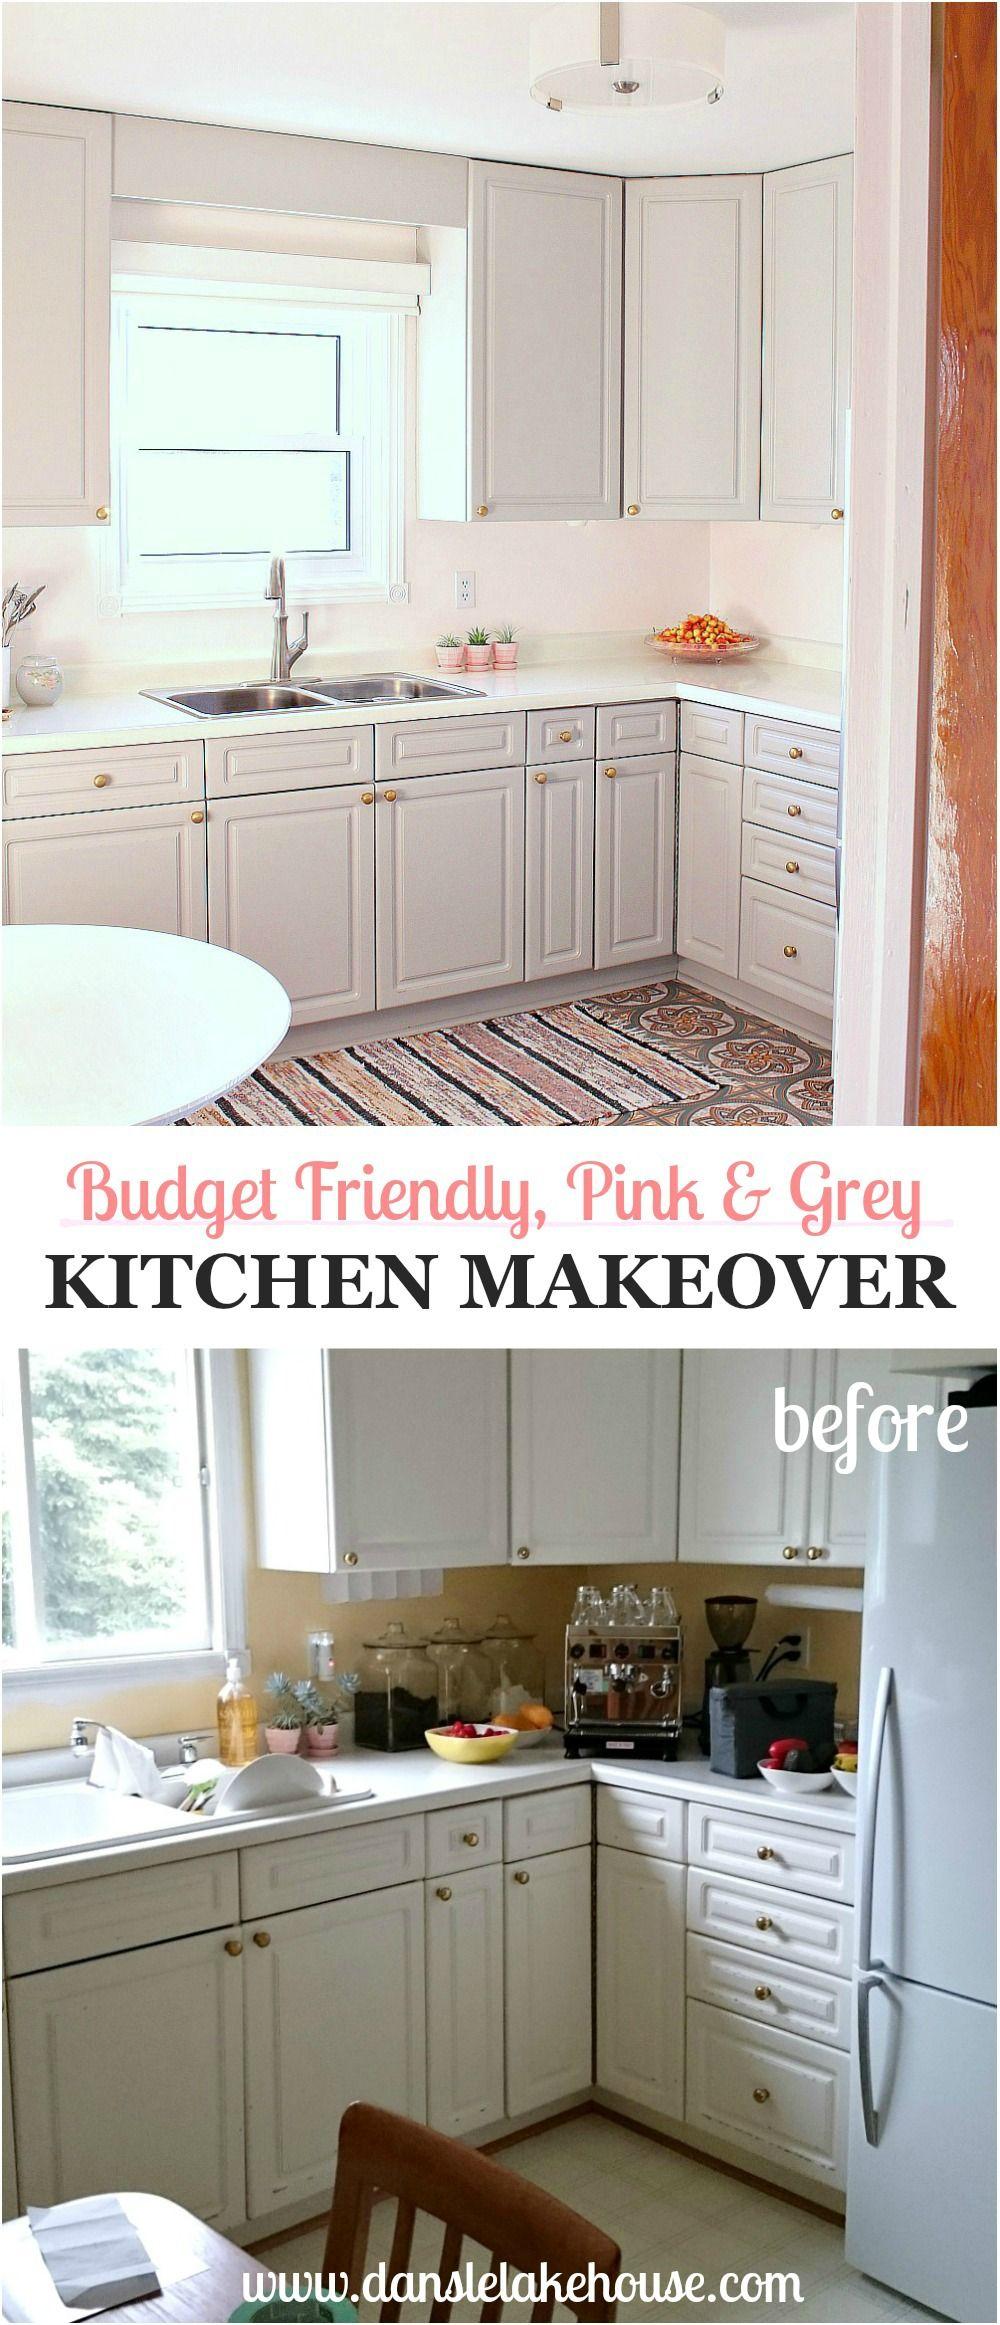 Diy Budget Friendly Kitchen Makeover Diy Kitchen Remodel Diy